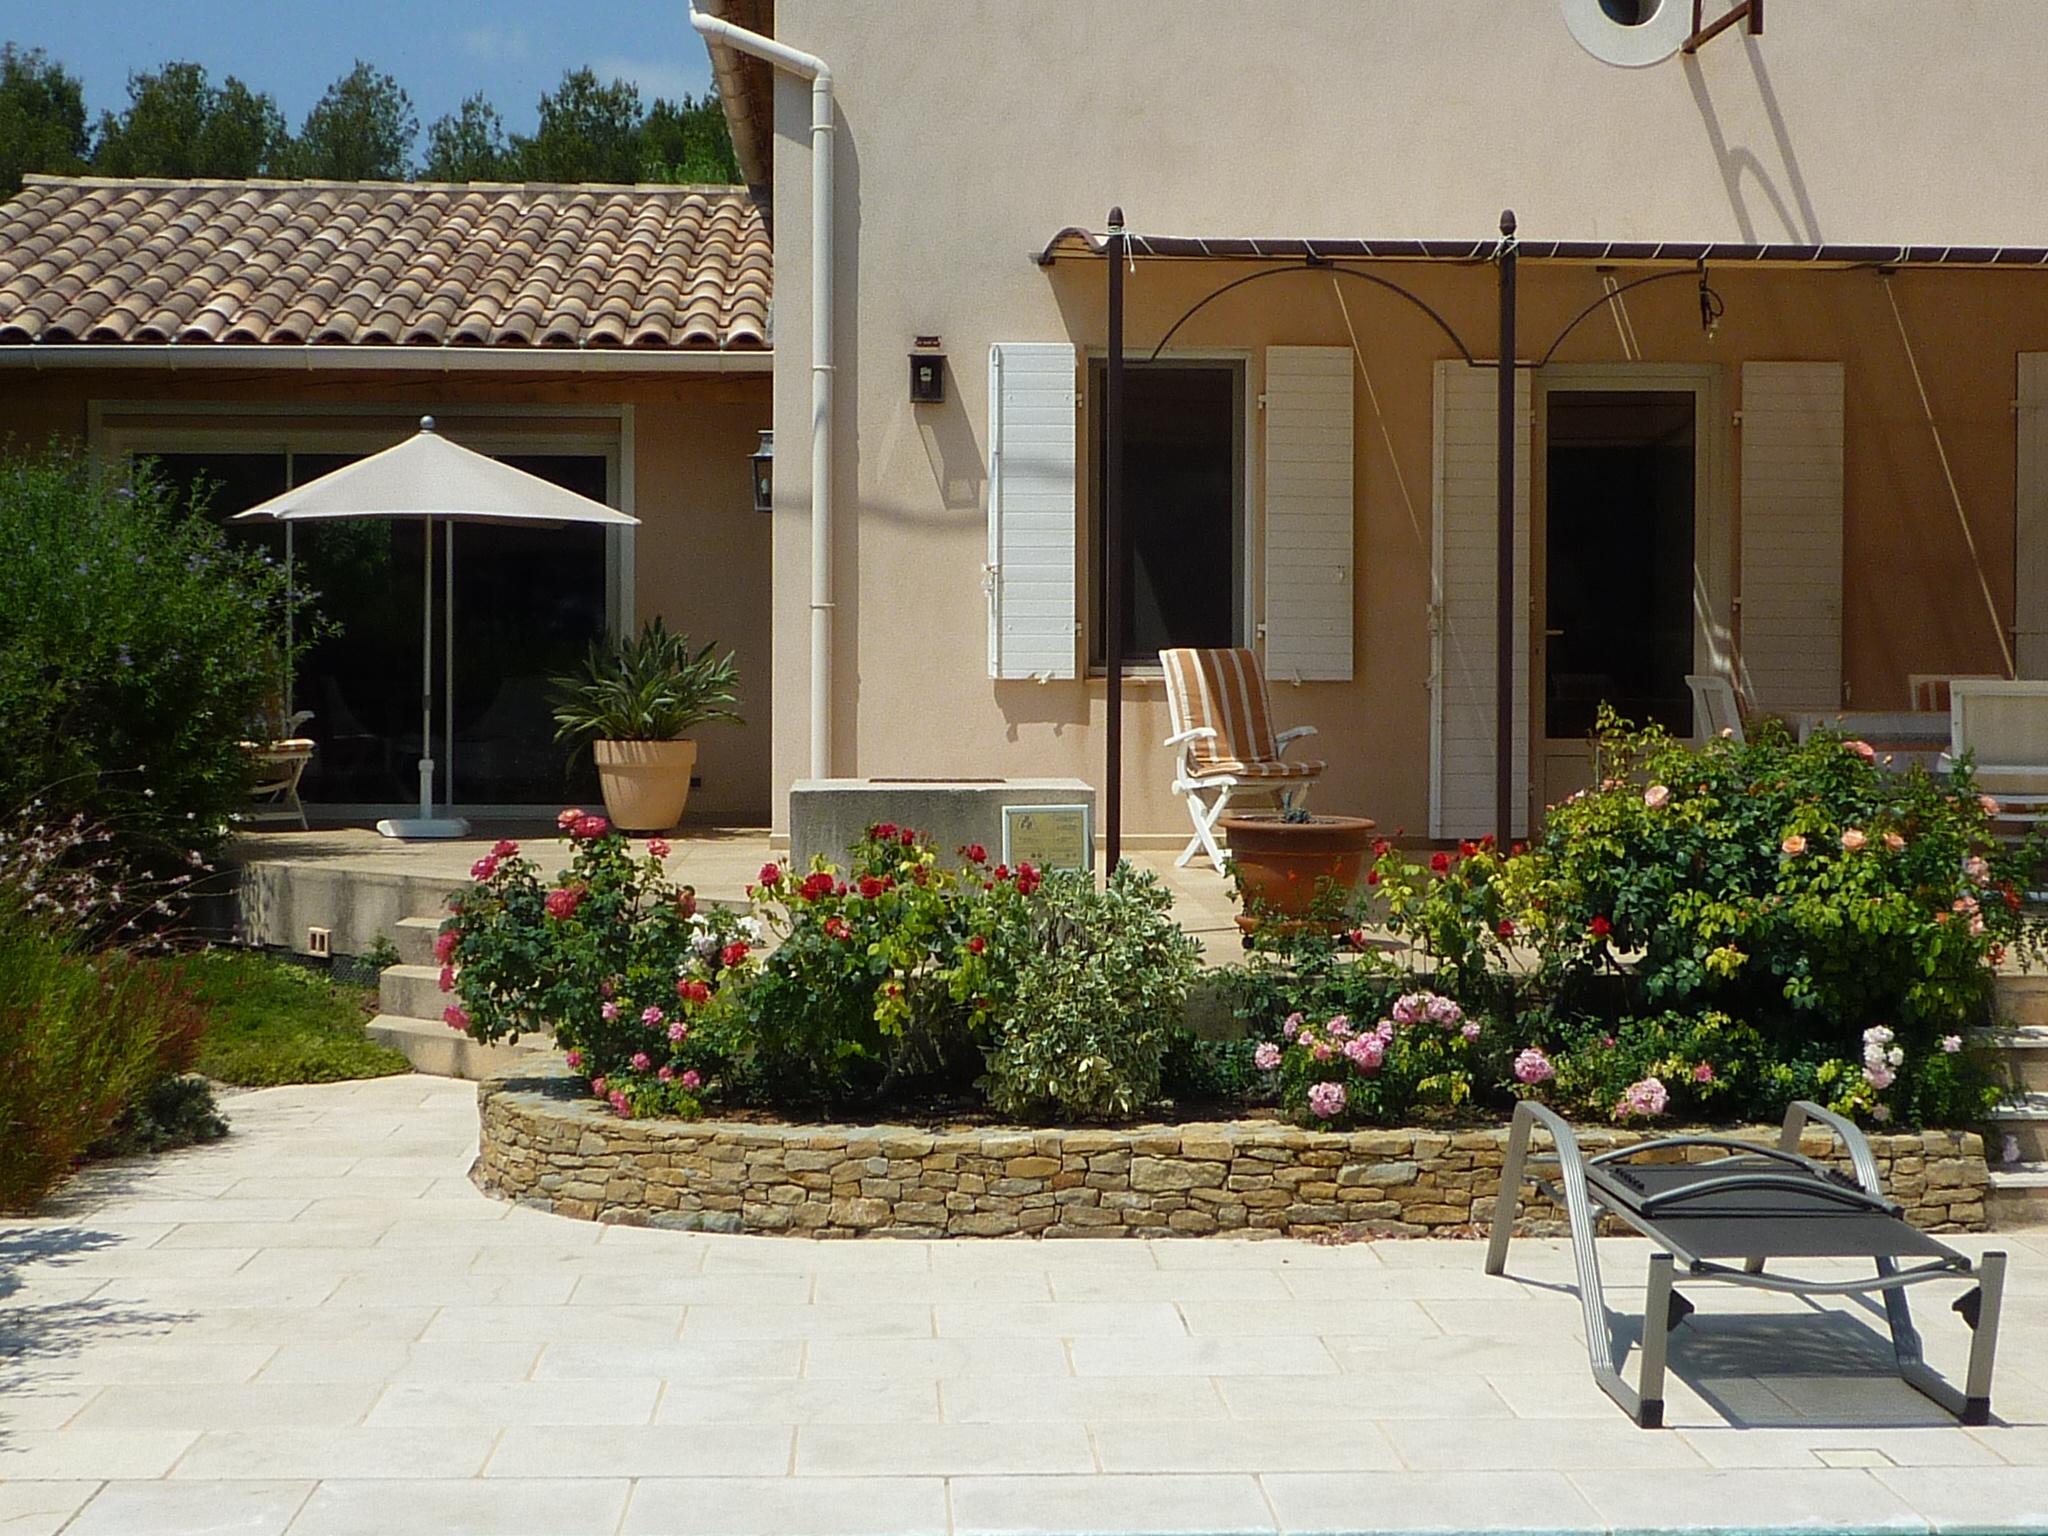 Image_13, Maison / villa, Saint-Cyr-sur-Mer, ref :30870